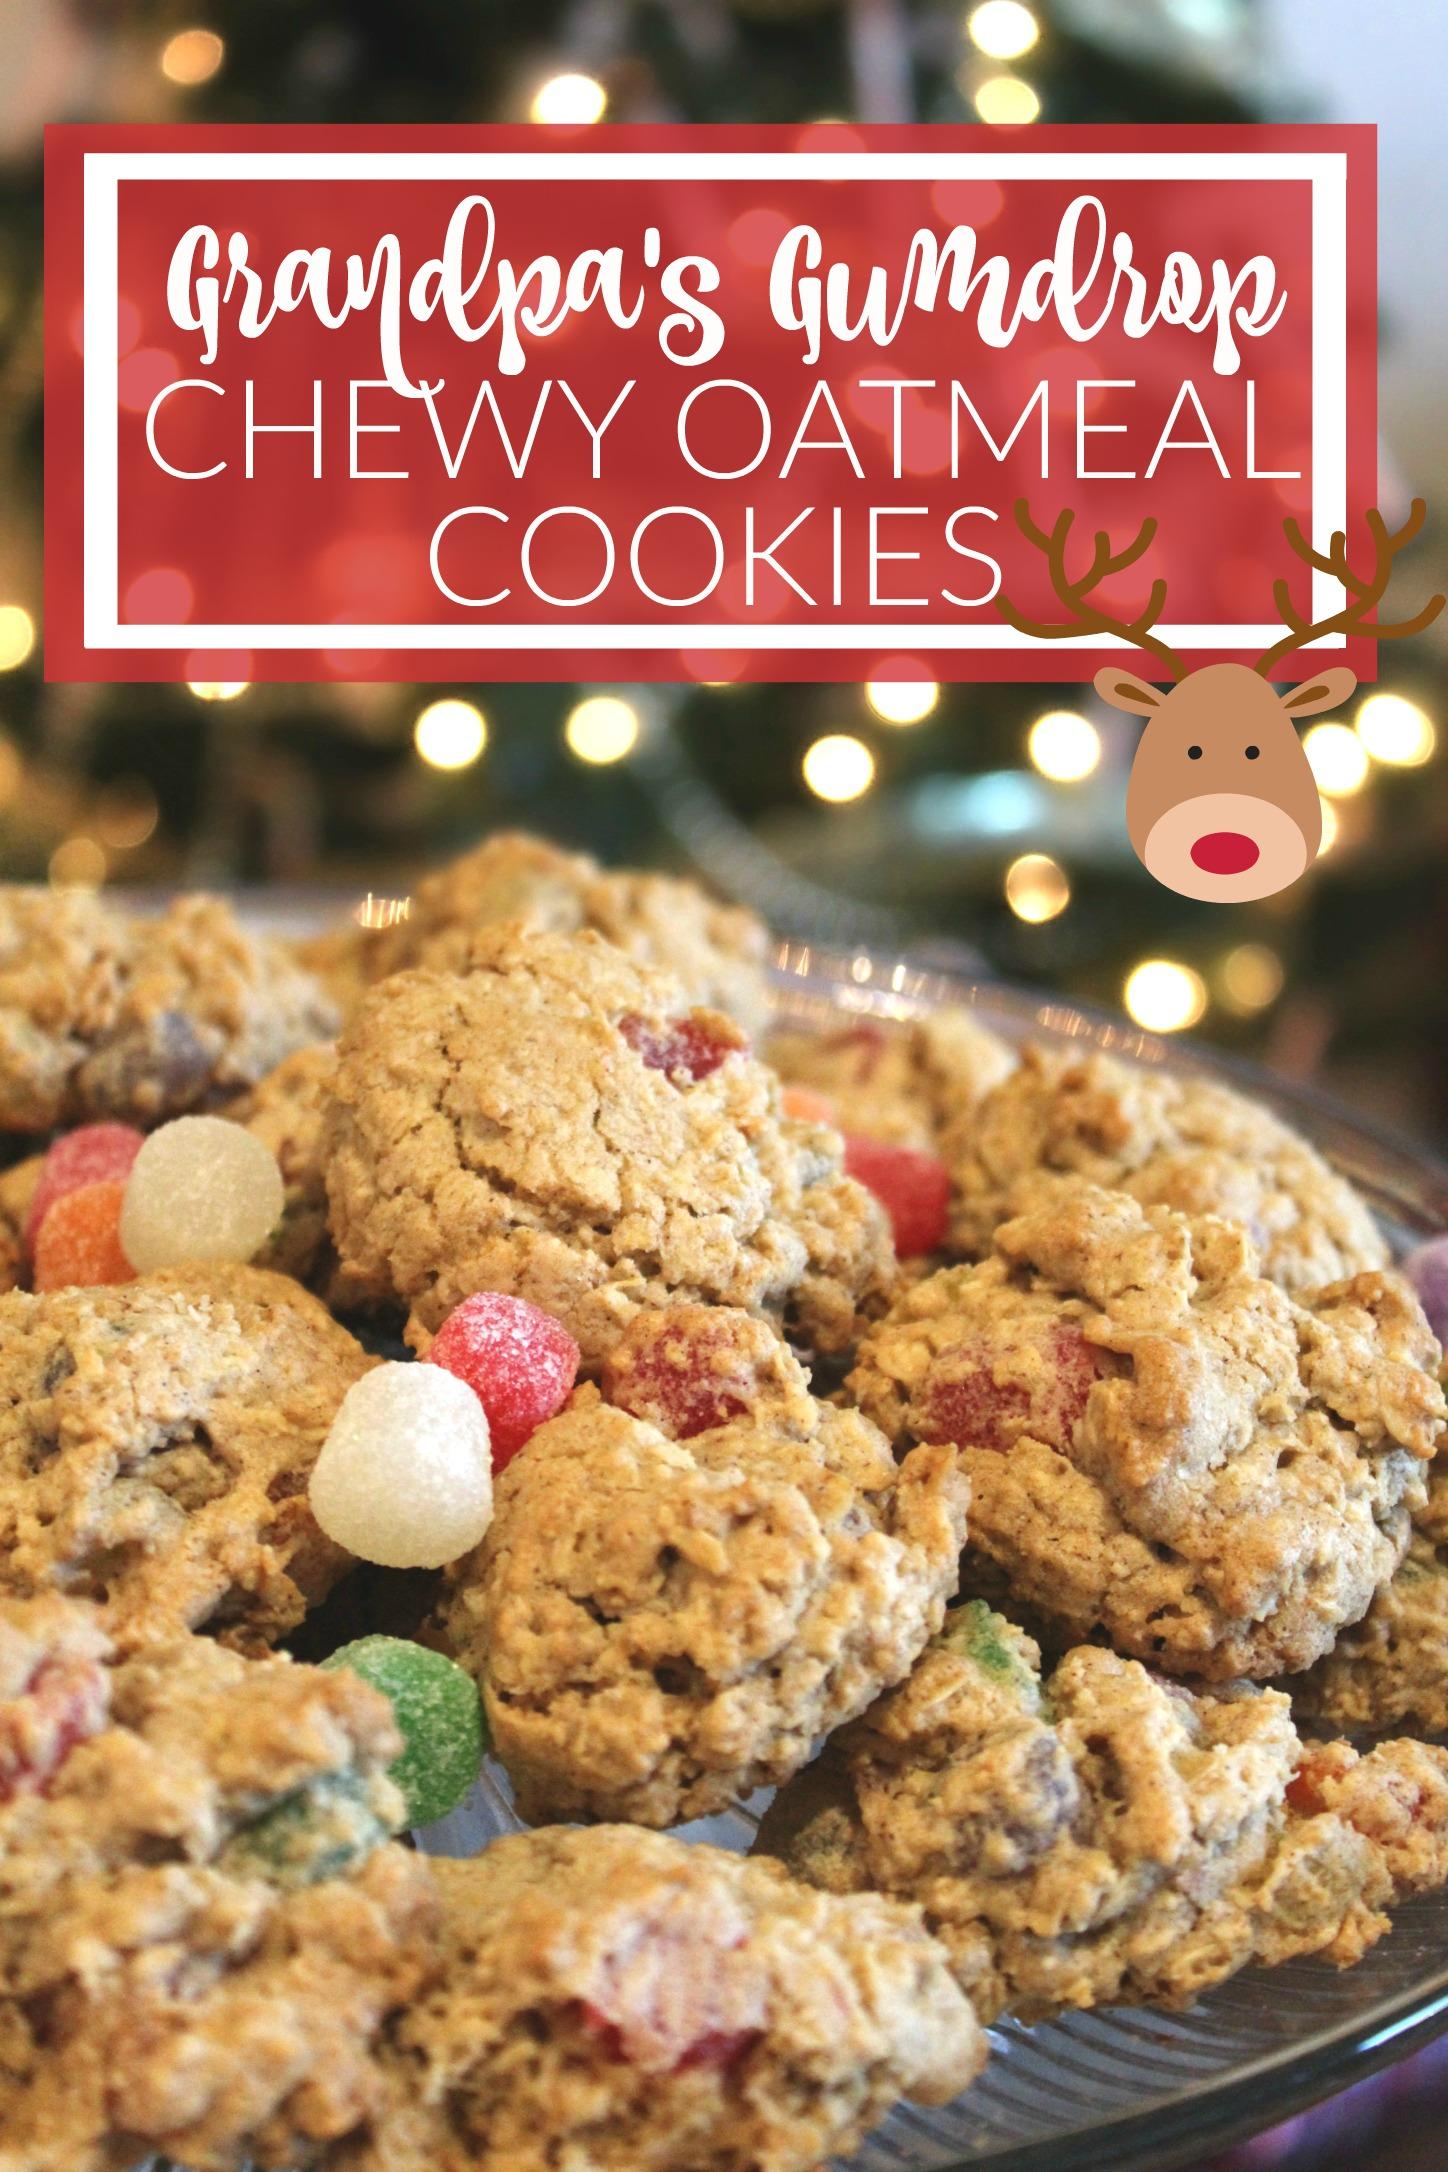 Grandpa's Grumdrop Chewy Oatmeal Cookies